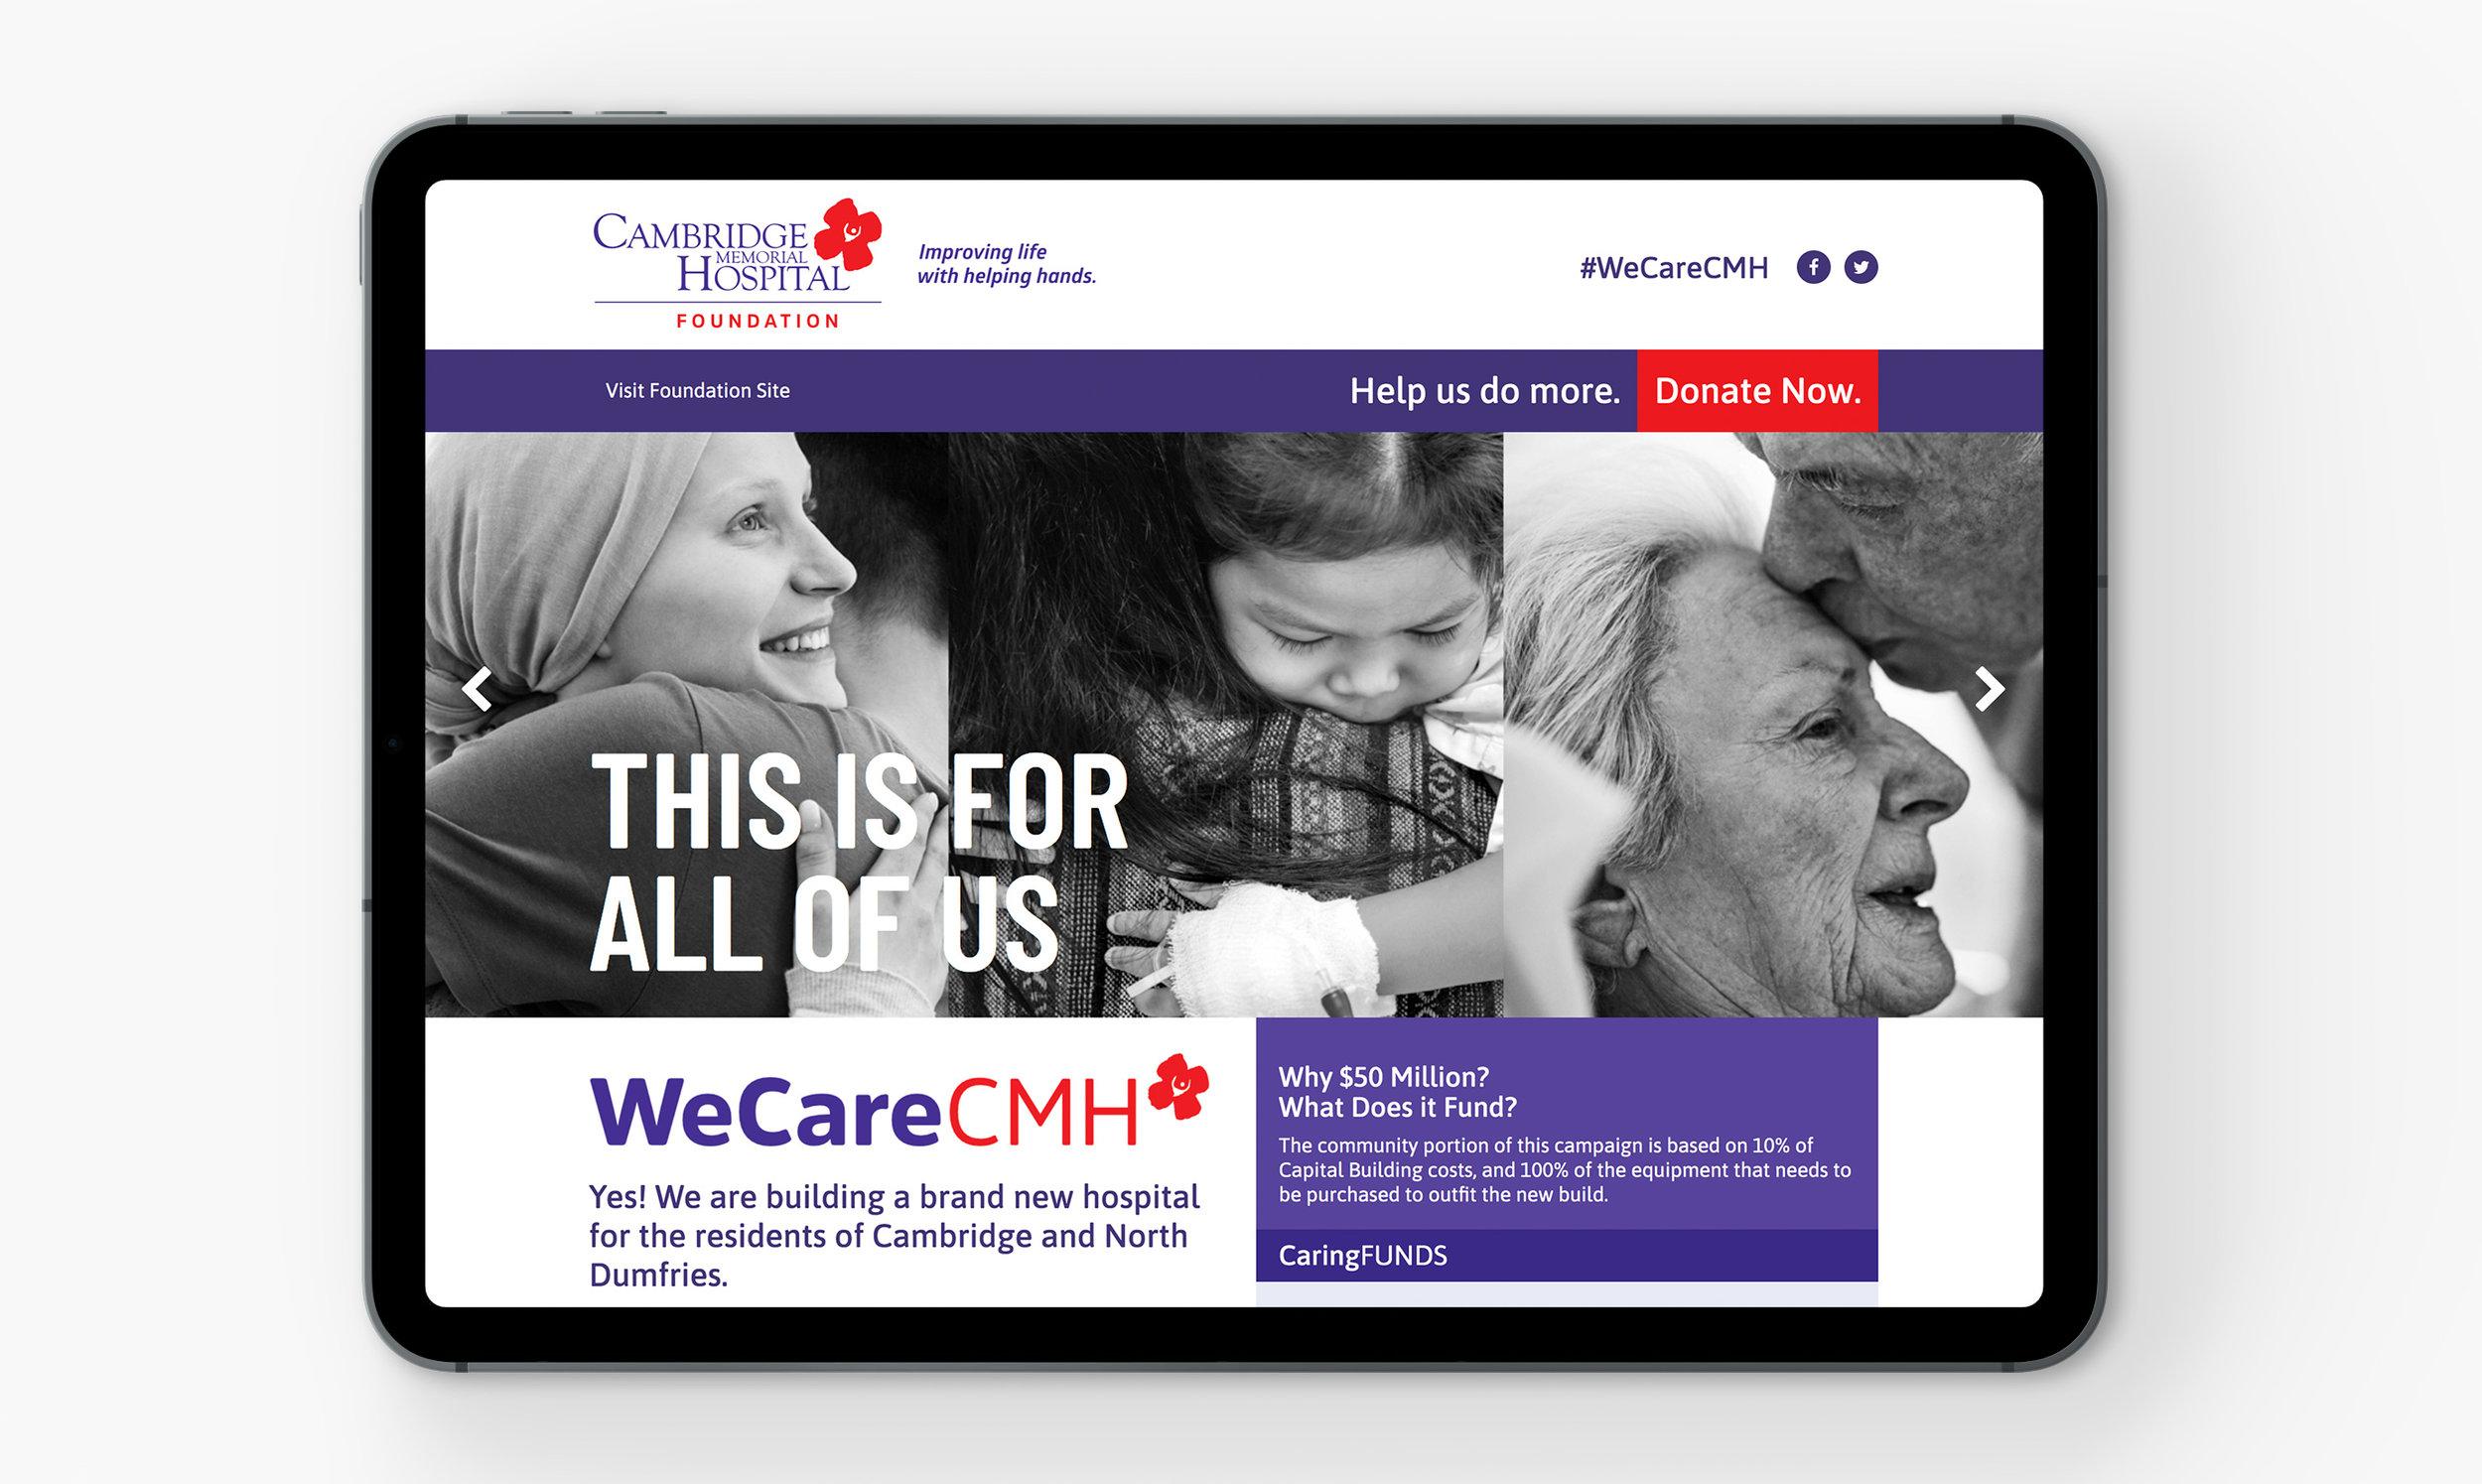 CambridgeMemorialHospitalFoundation_Ebbnflowcreative_WeCareCMH_Website.jpg